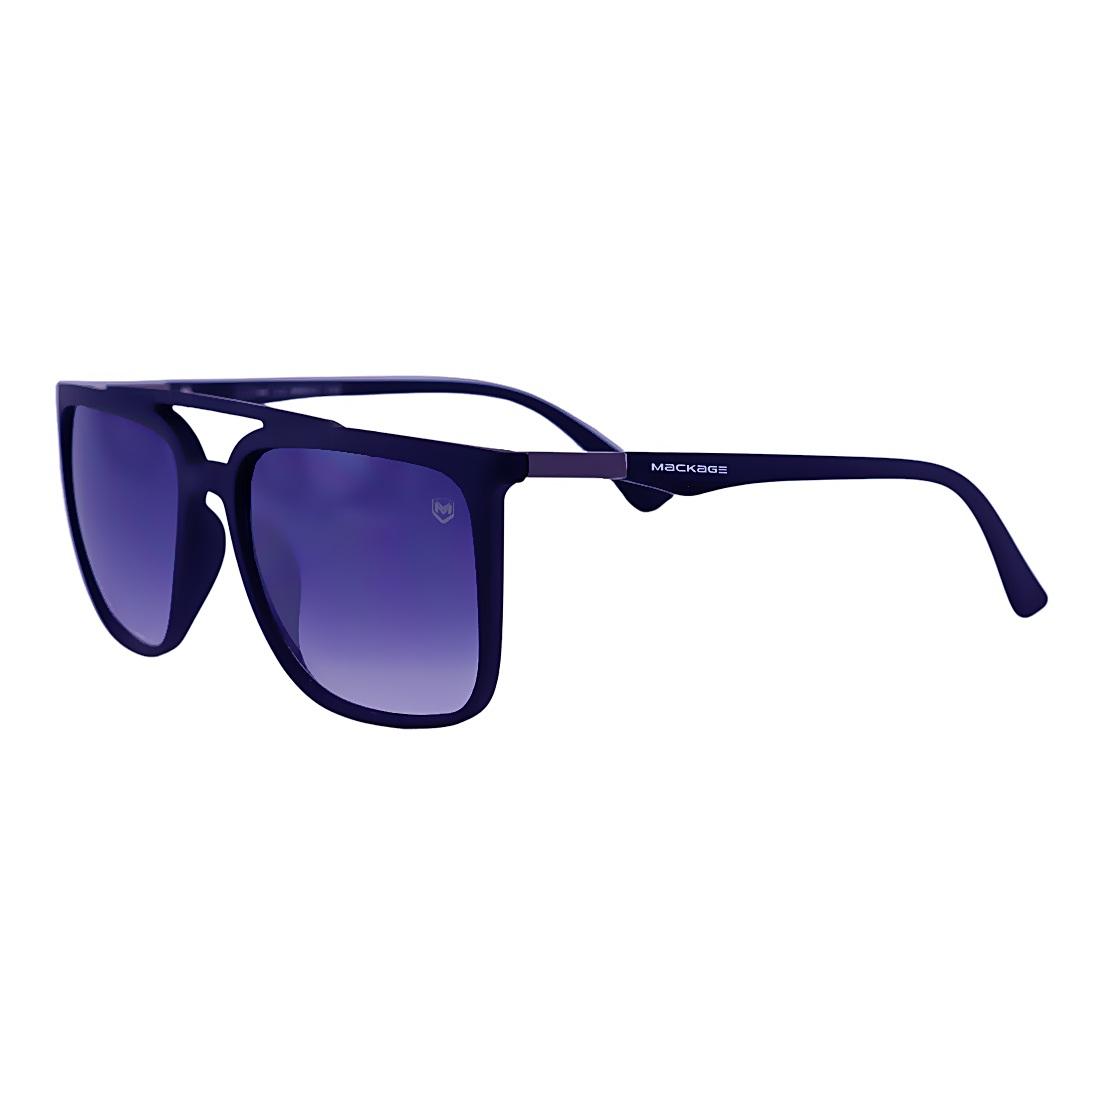 Óculos De Sol Mackage Masculino Acetato Retangular - Preto Fosco